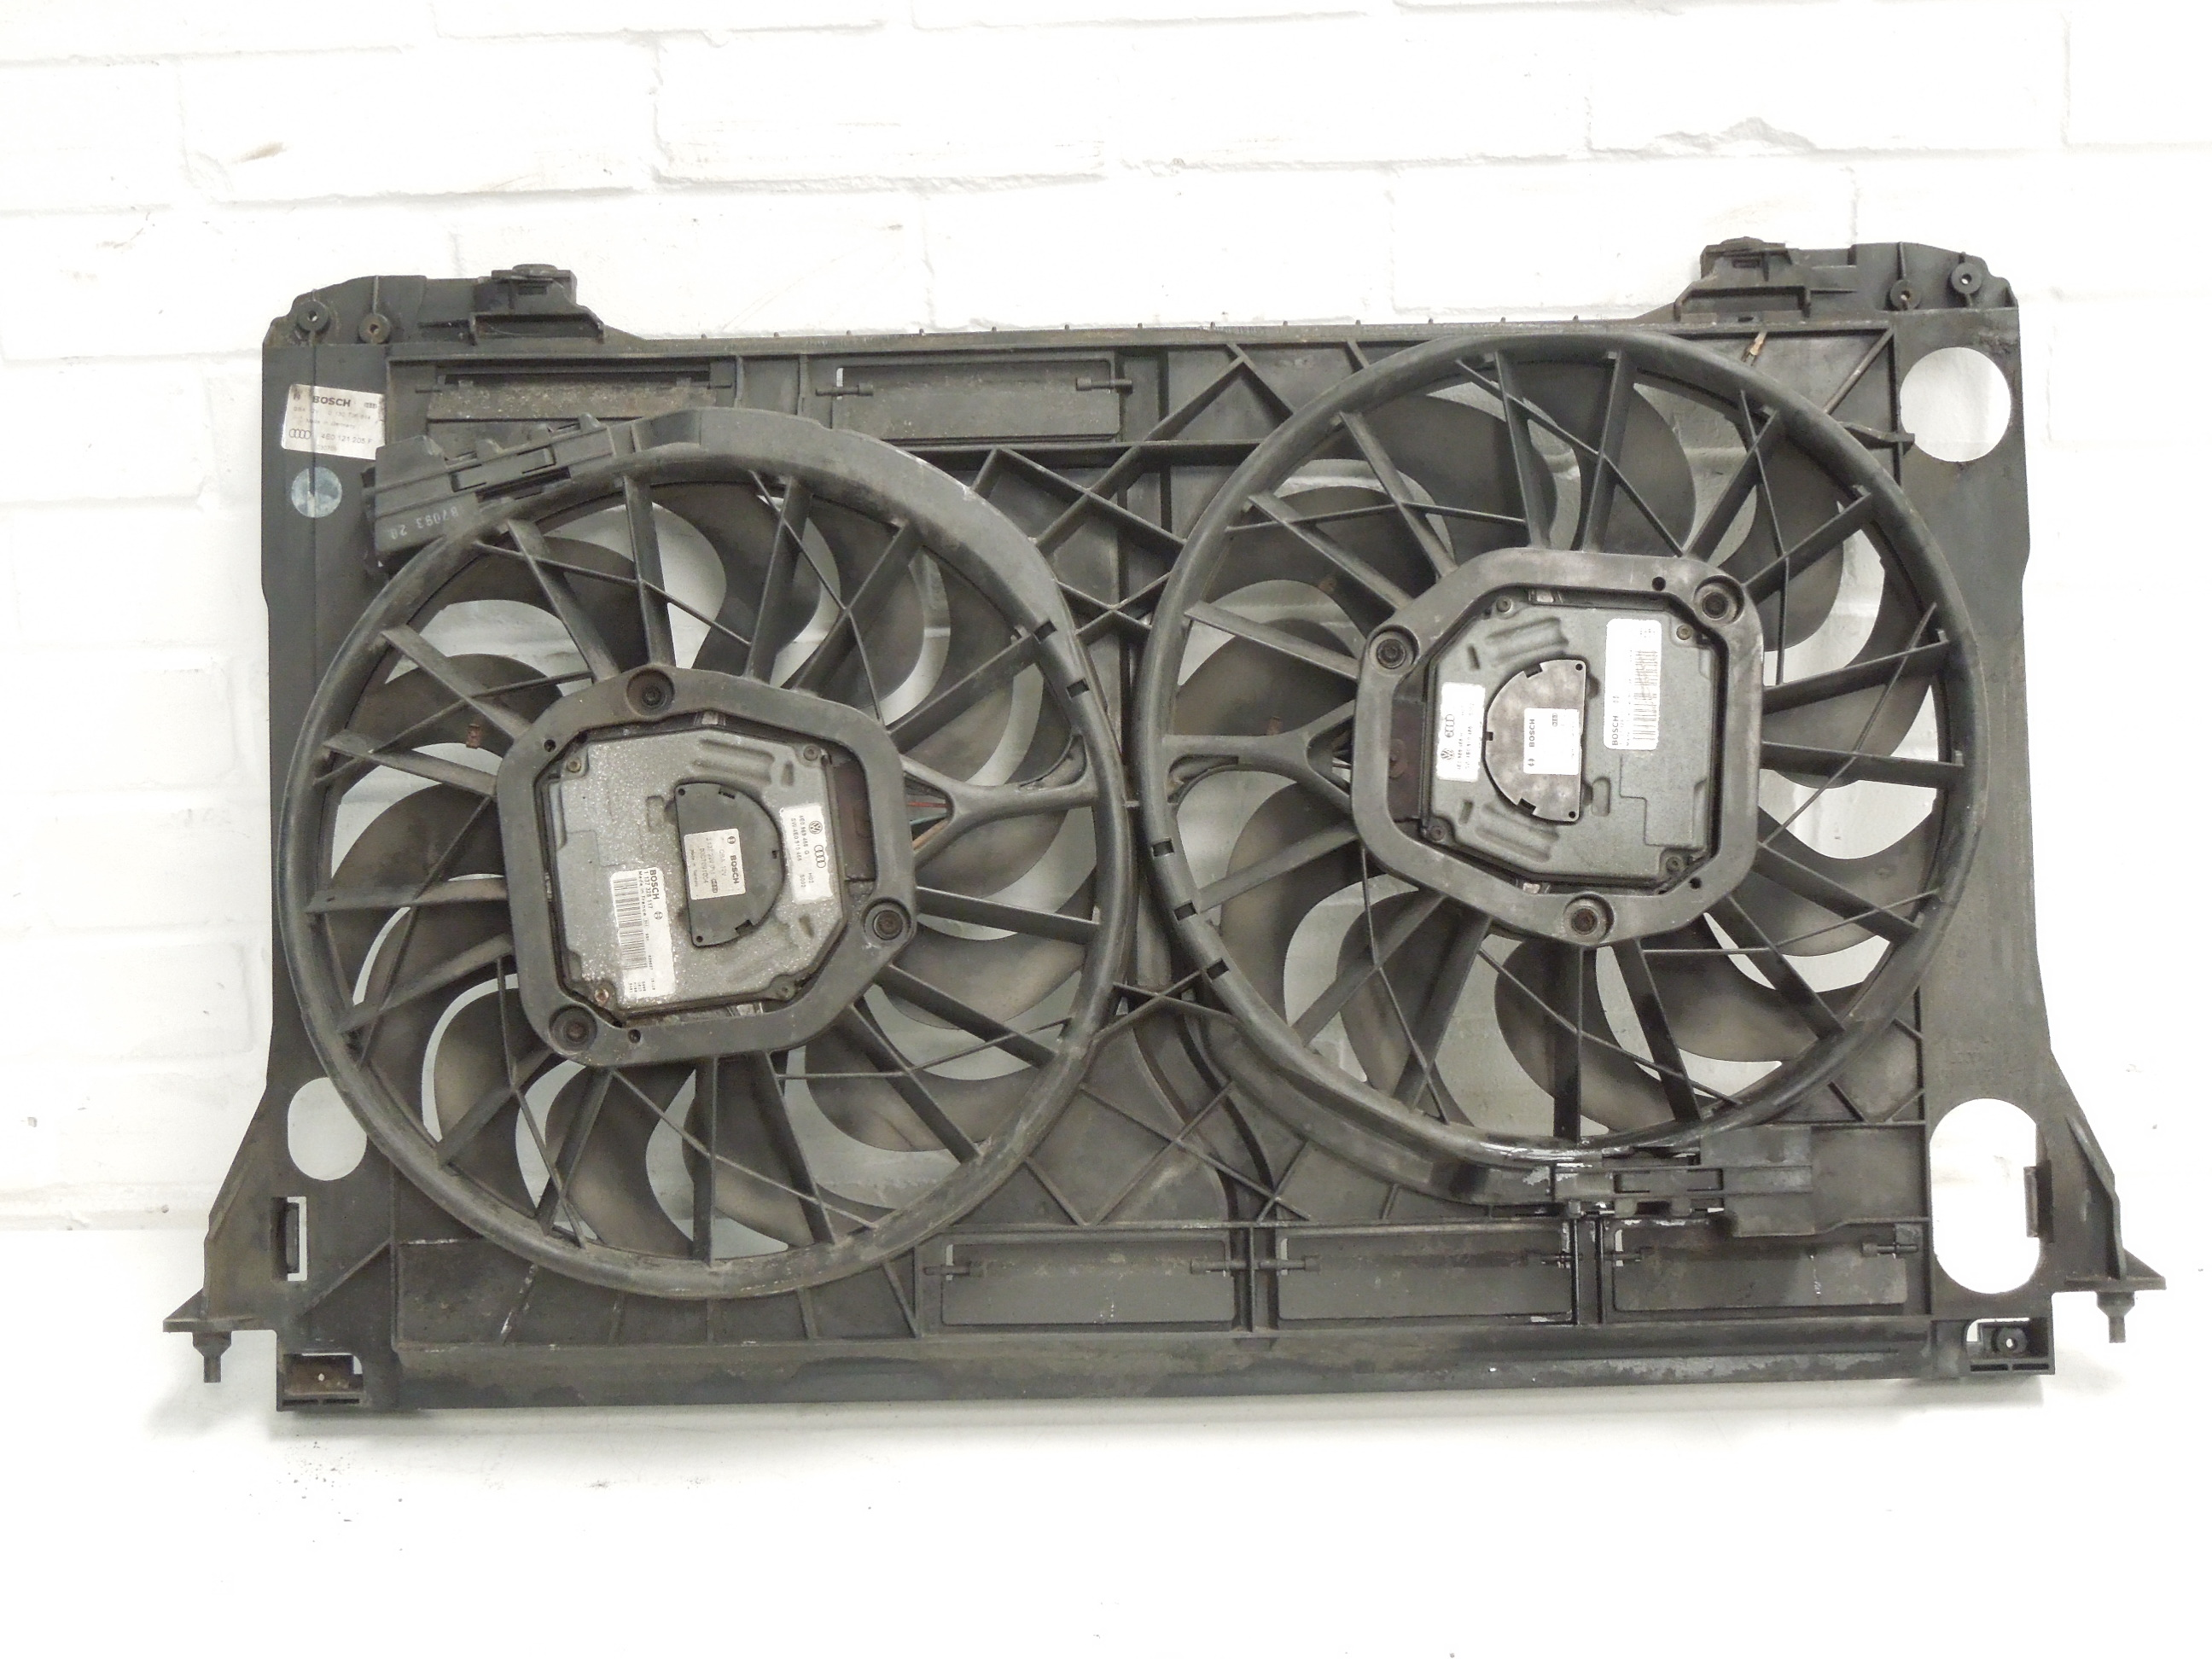 AUDI-A8-D3-V8-3-7-4-2-radiador-electrico-doble-refrigeracion-ventiladores-en-panel